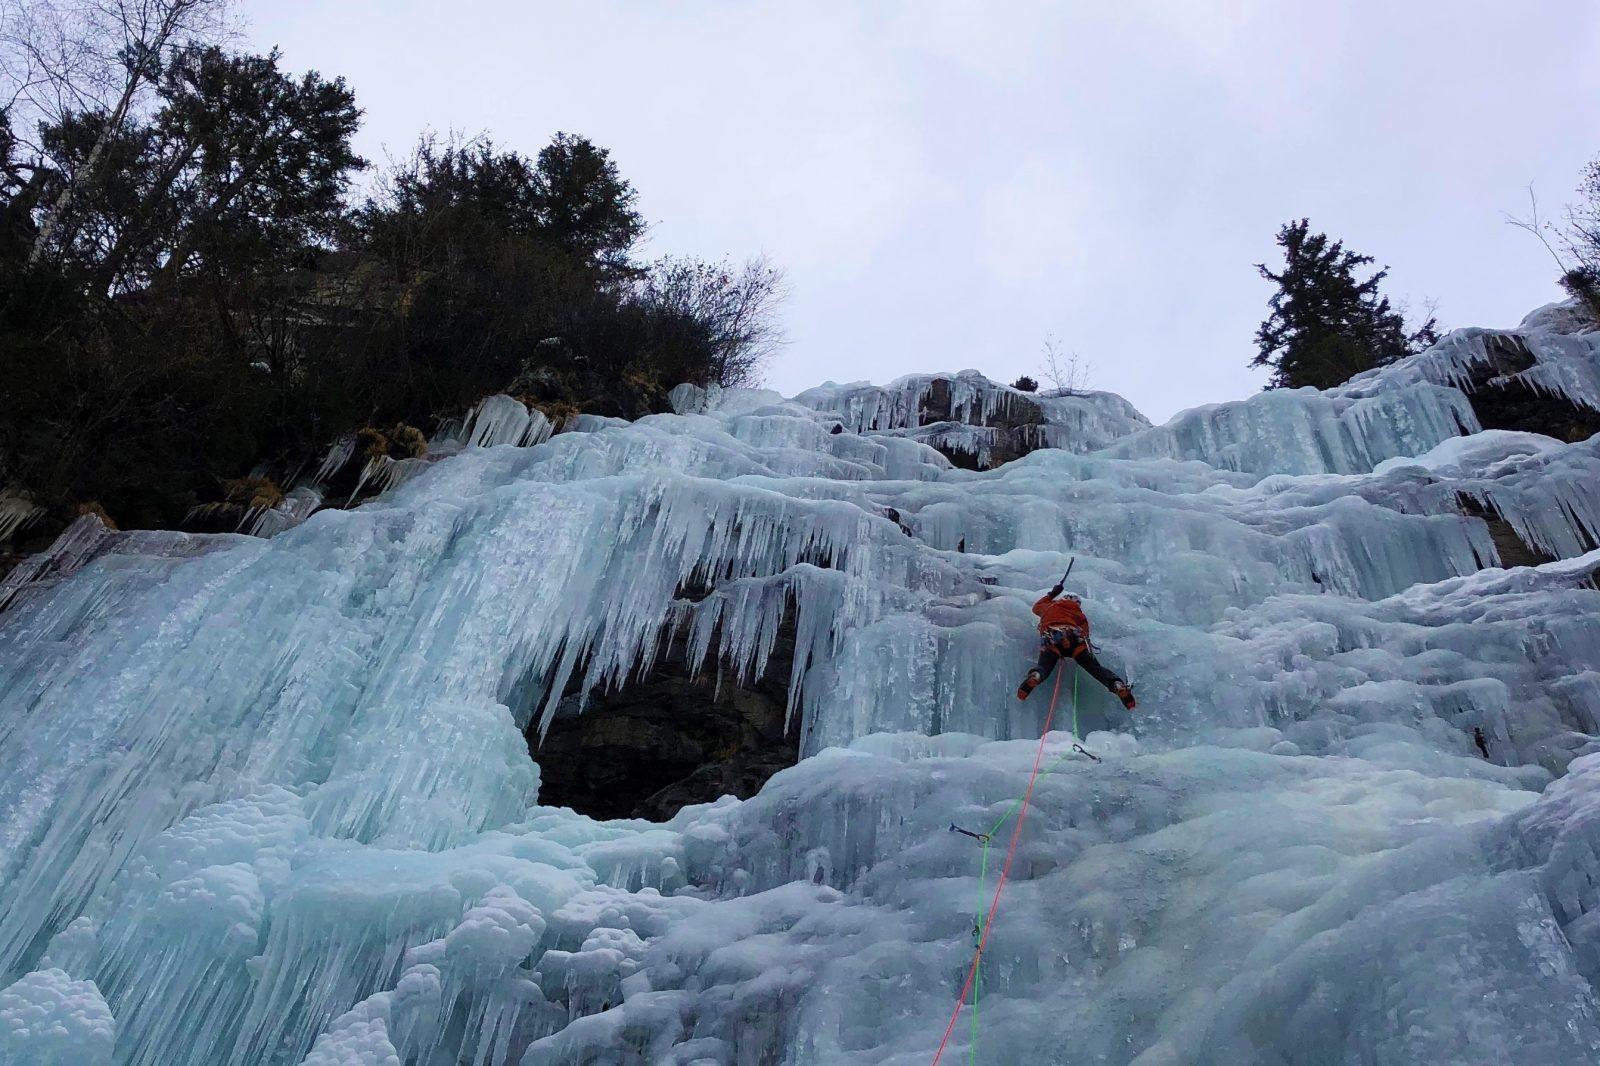 Eisklettern am Luisbodenfall, Foto: Mario Kaeppeli |Climbers Paradise